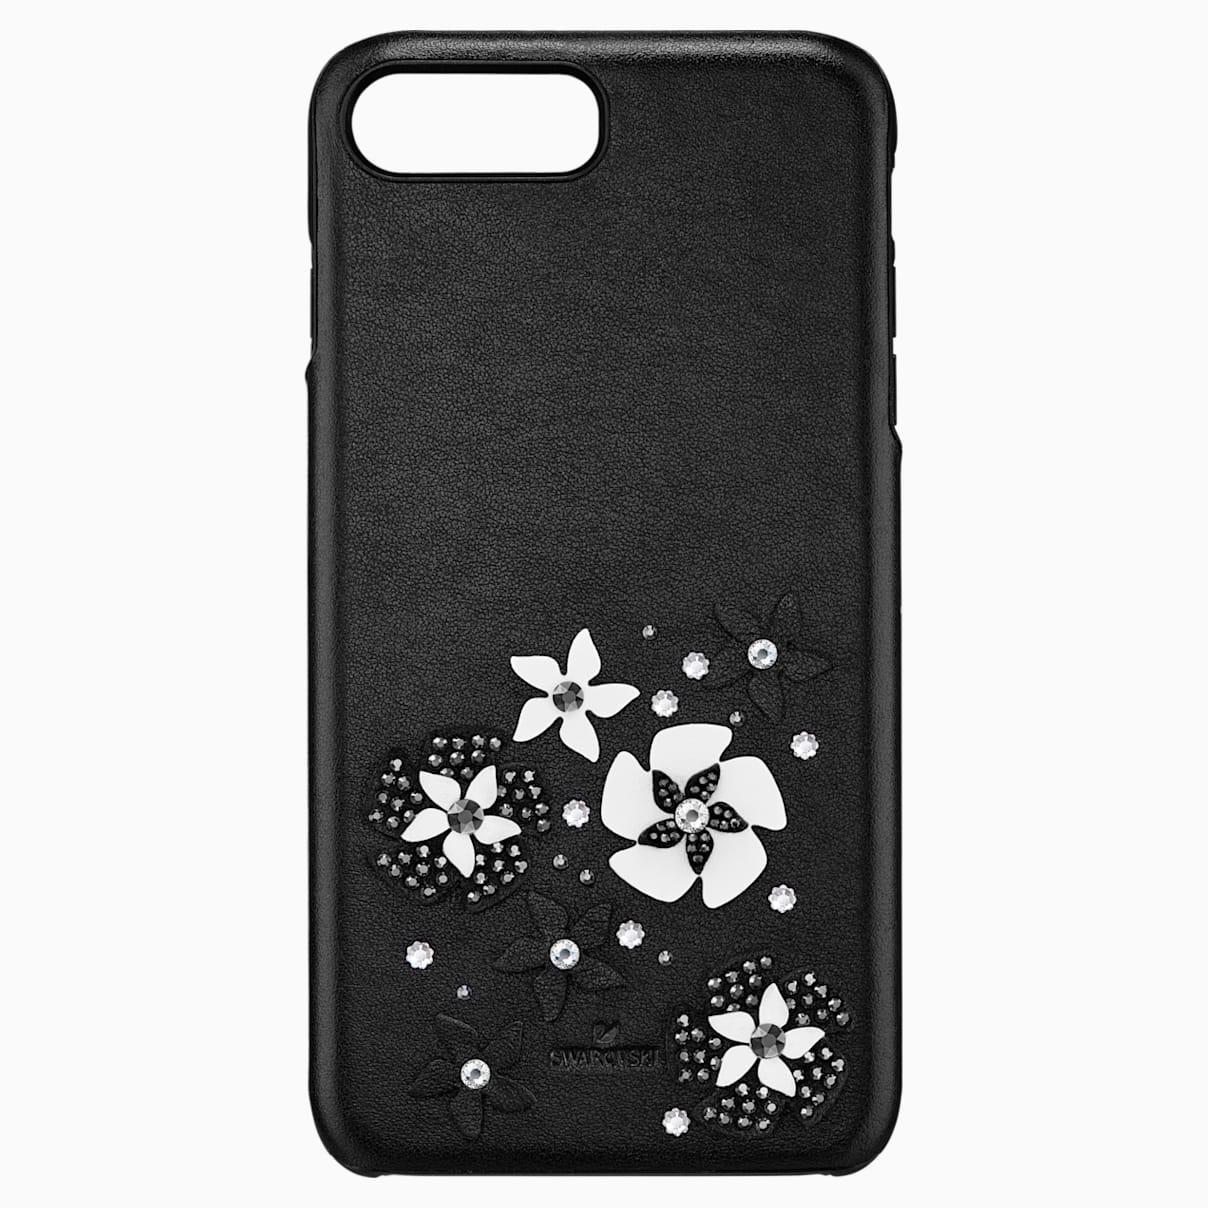 Levně Swarovski Mazy Smartphone Case with integrated Bumper, iPhone® 8 Plus, Black